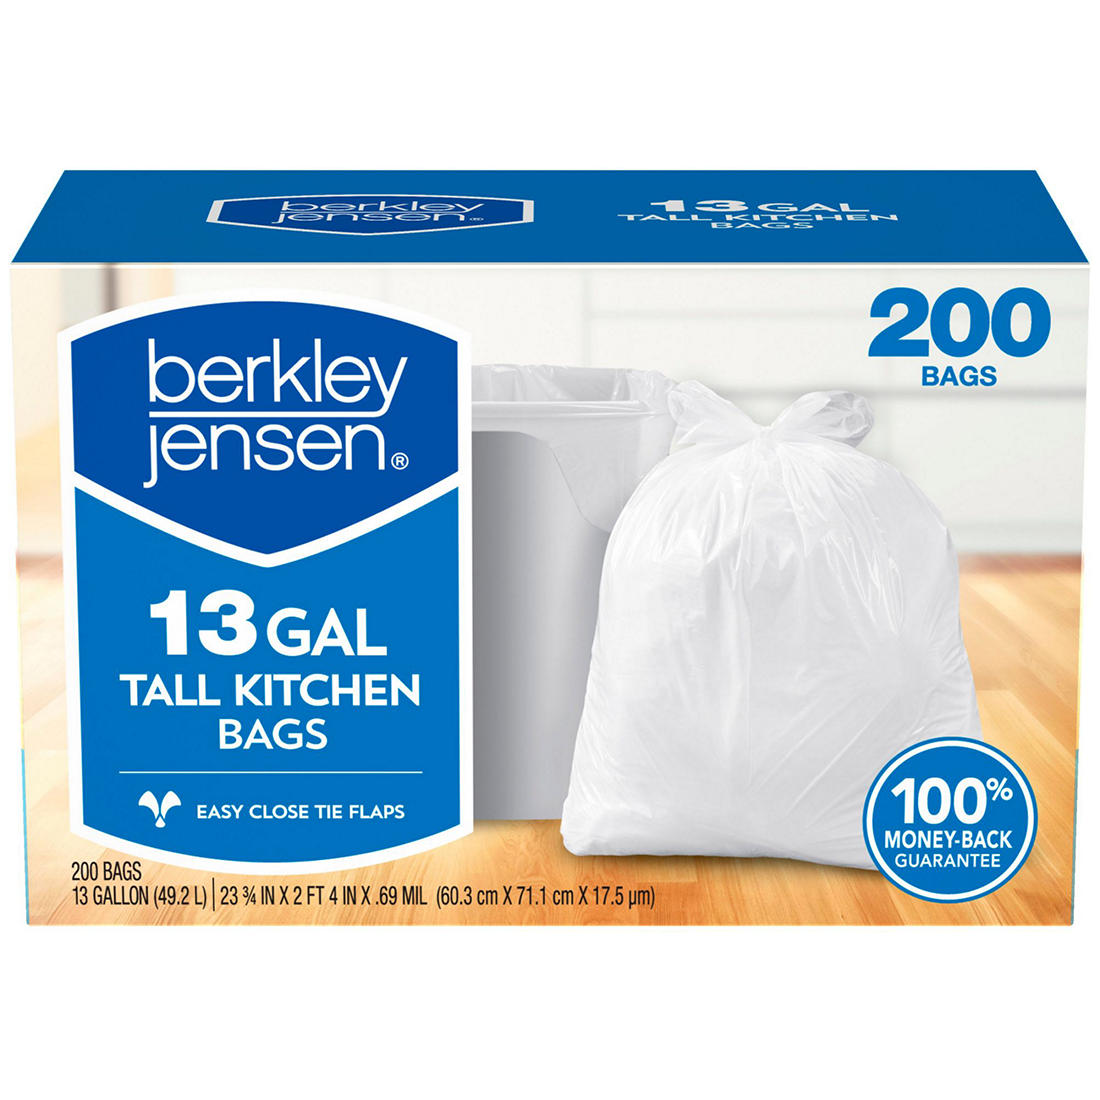 Berkley Jensen 13 Gal 0 69ml Kitchen Bags 200 Ct